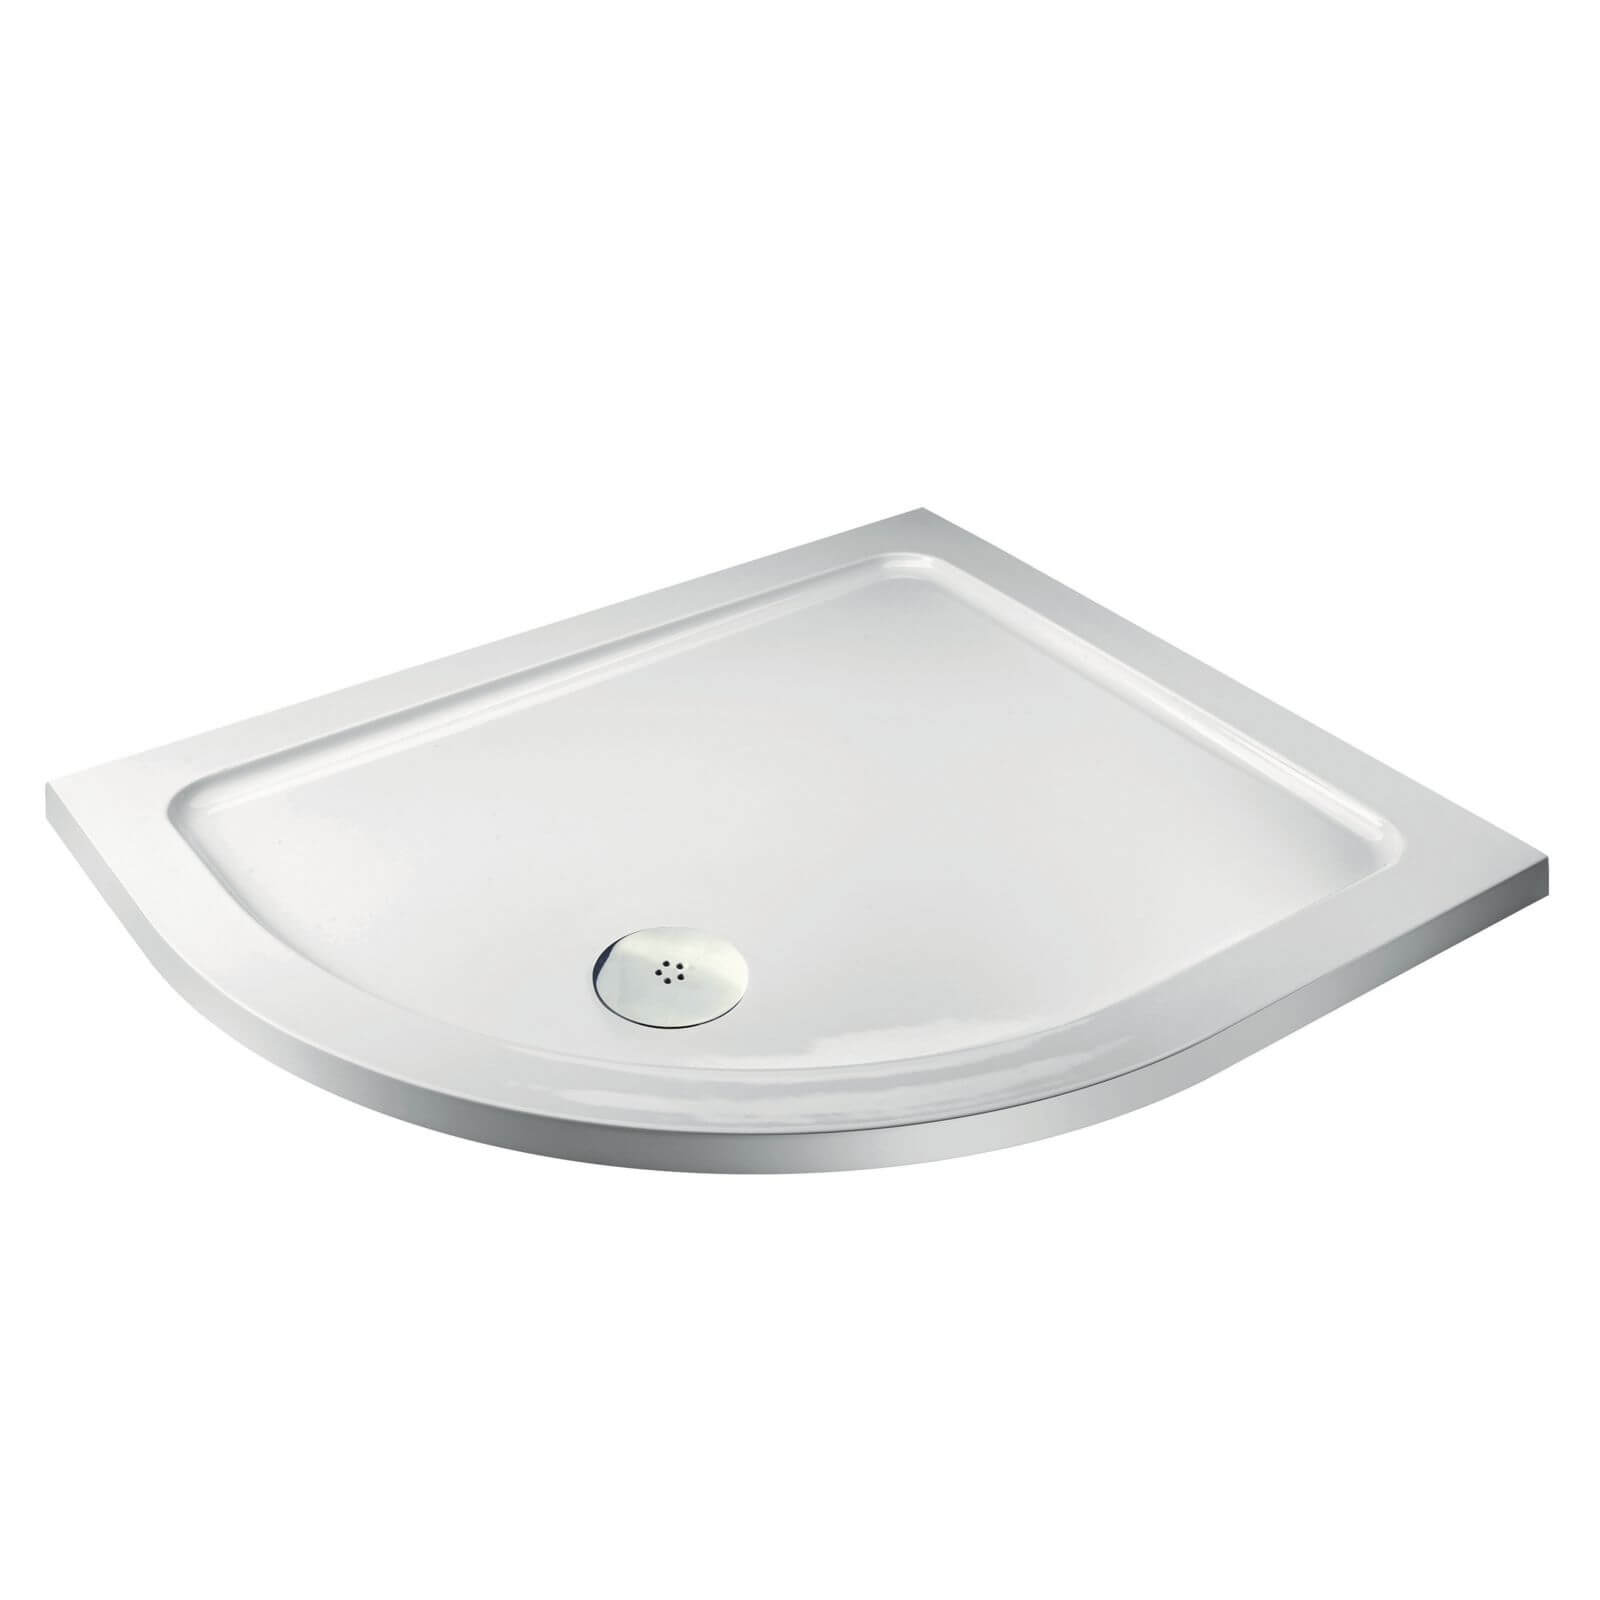 Aqualux Offset Quadrant LH Shower Tray - 1200 x 900 x 35mm